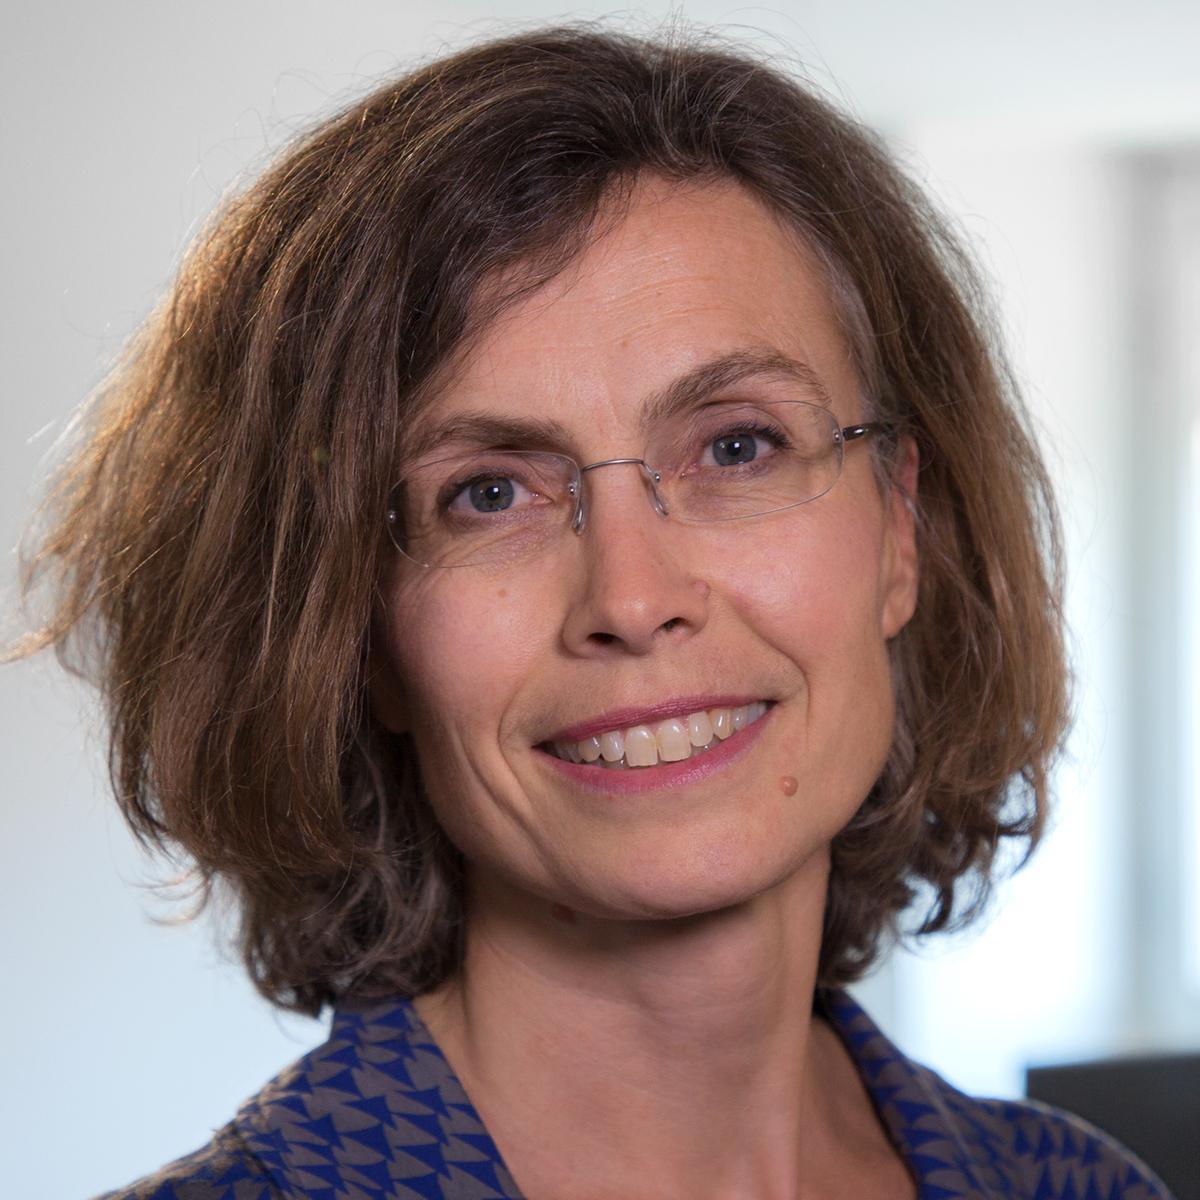 Judith Heitkamp